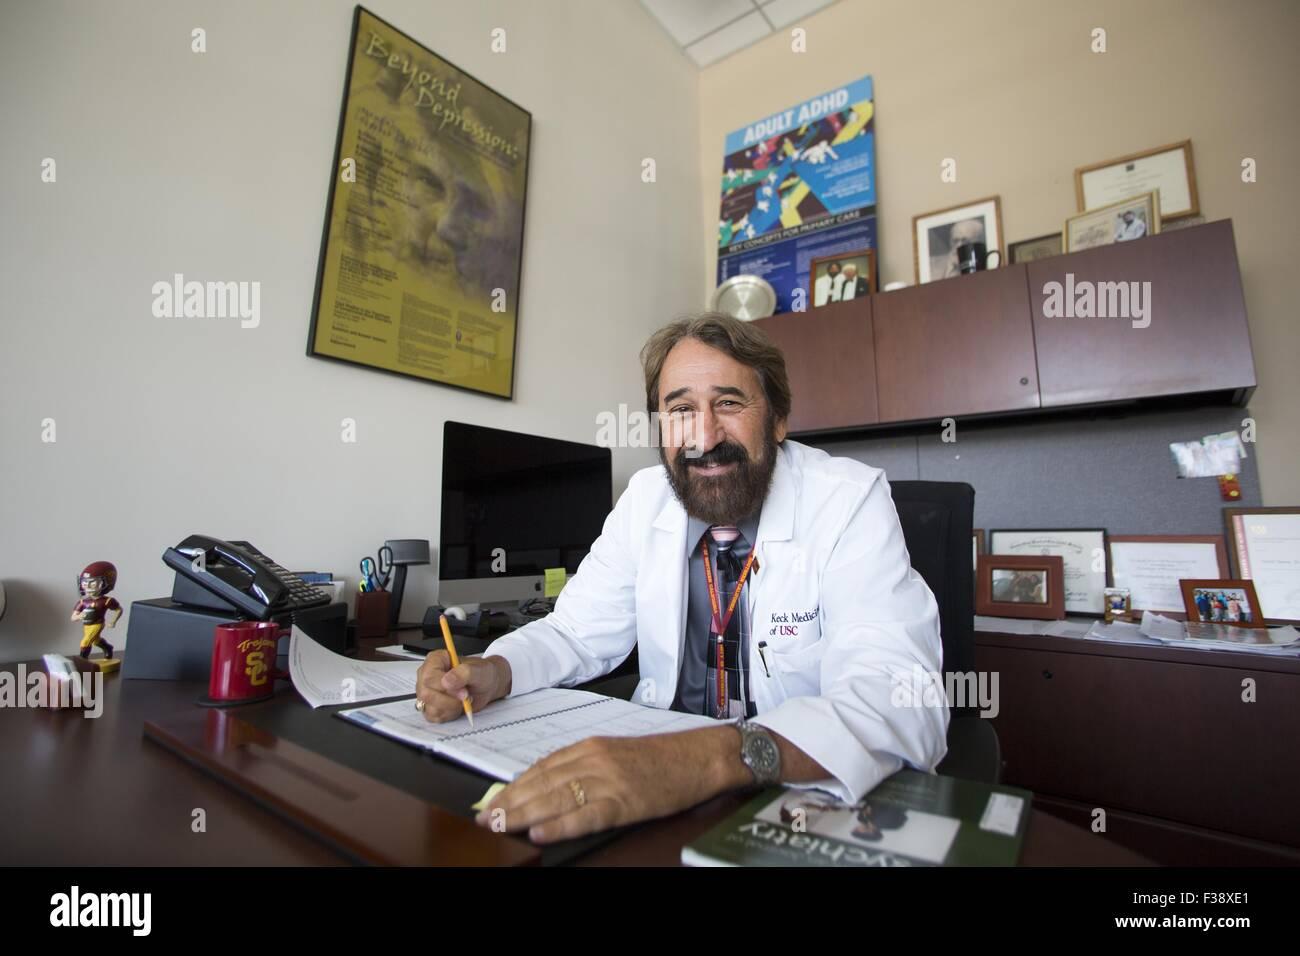 Los Angeles, California, USA  15th Sep, 2015  Dr  David